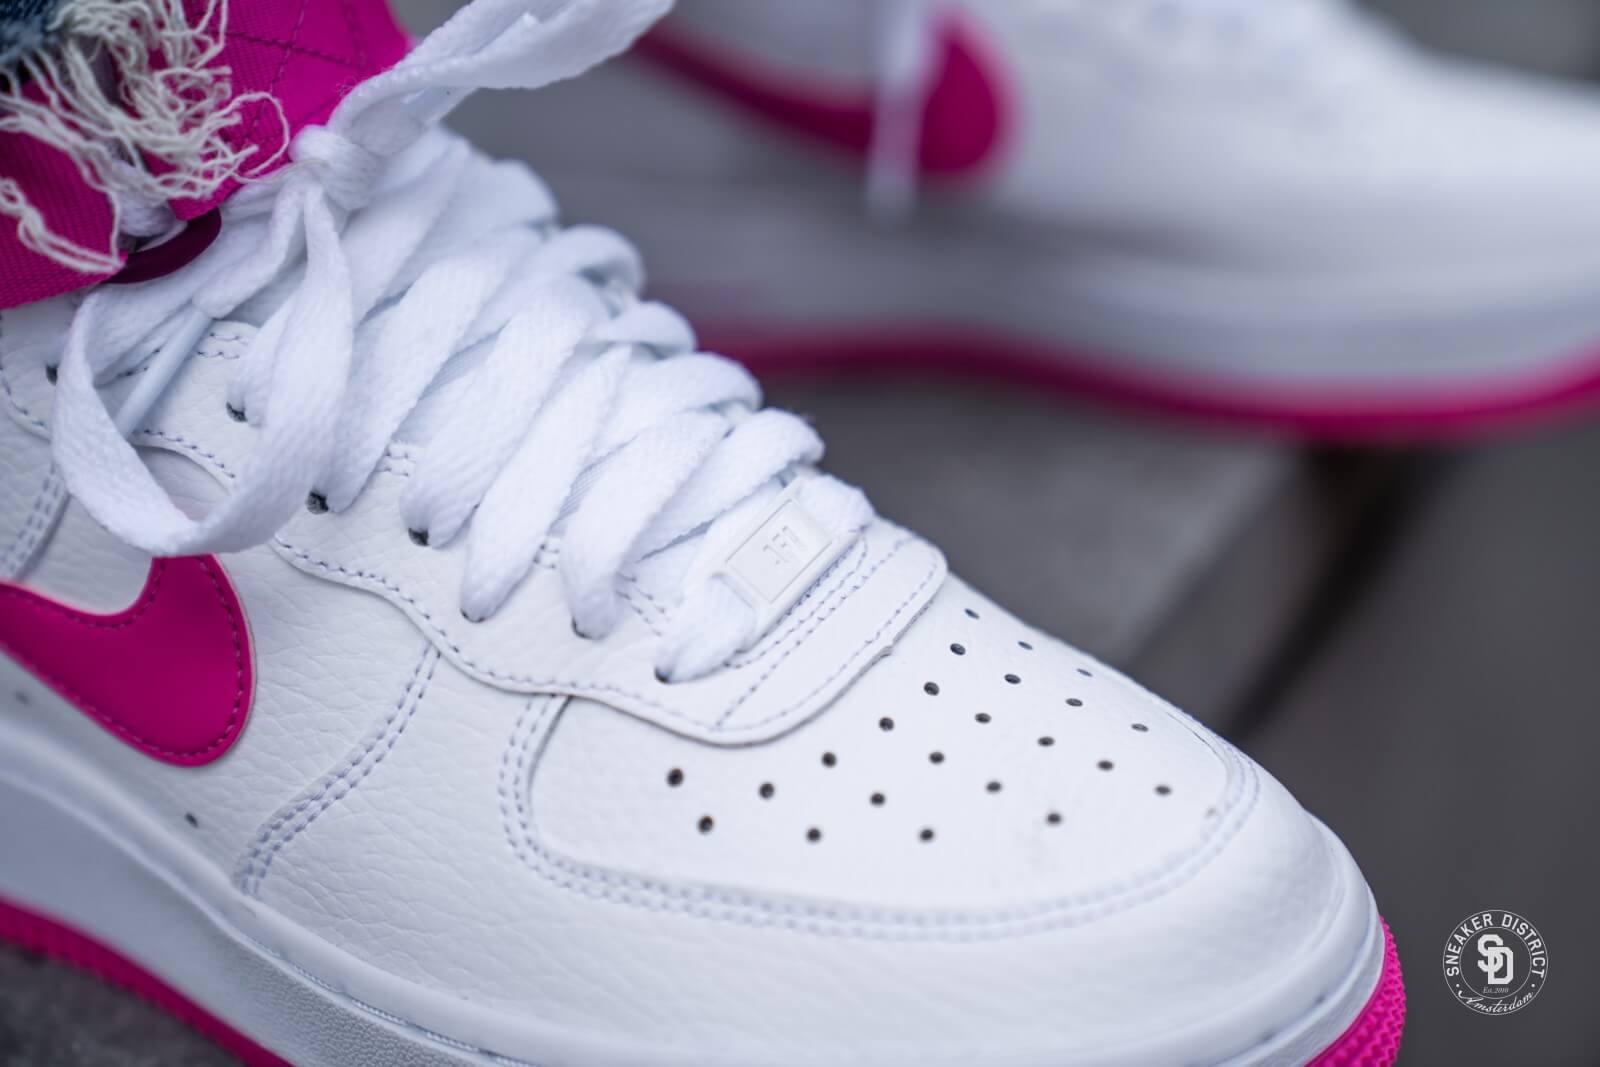 Nike Women's Air Force 1 High WhiteLaser Fuchsia True Berry